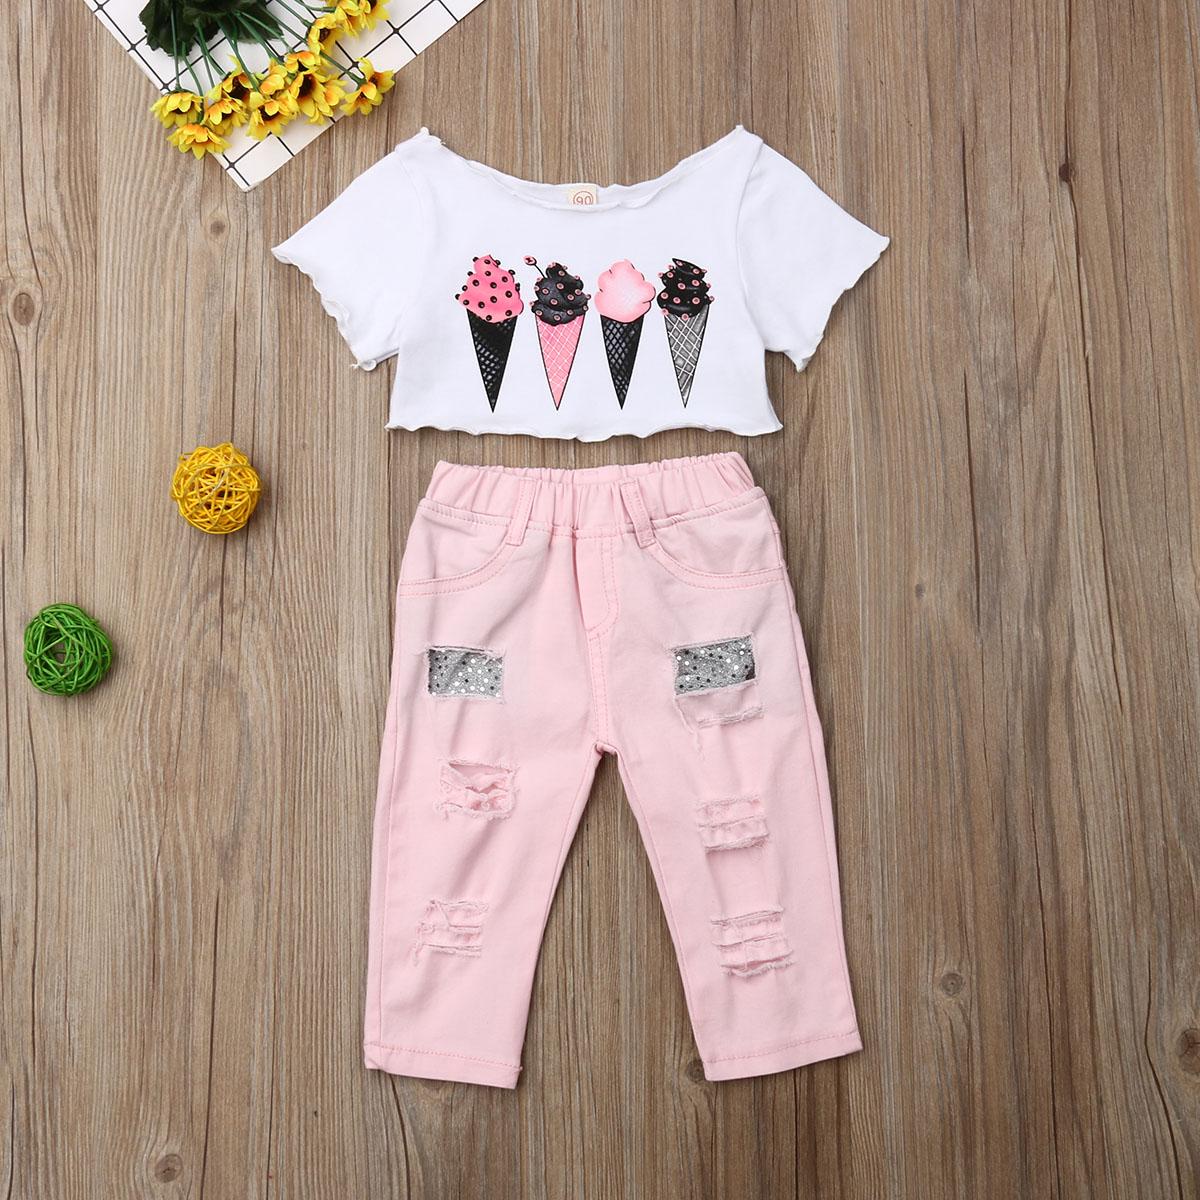 US Baby Girls Outfits 2PCS Pink Summer T-shirt+Denim Shorts Toddler Kids Clothes